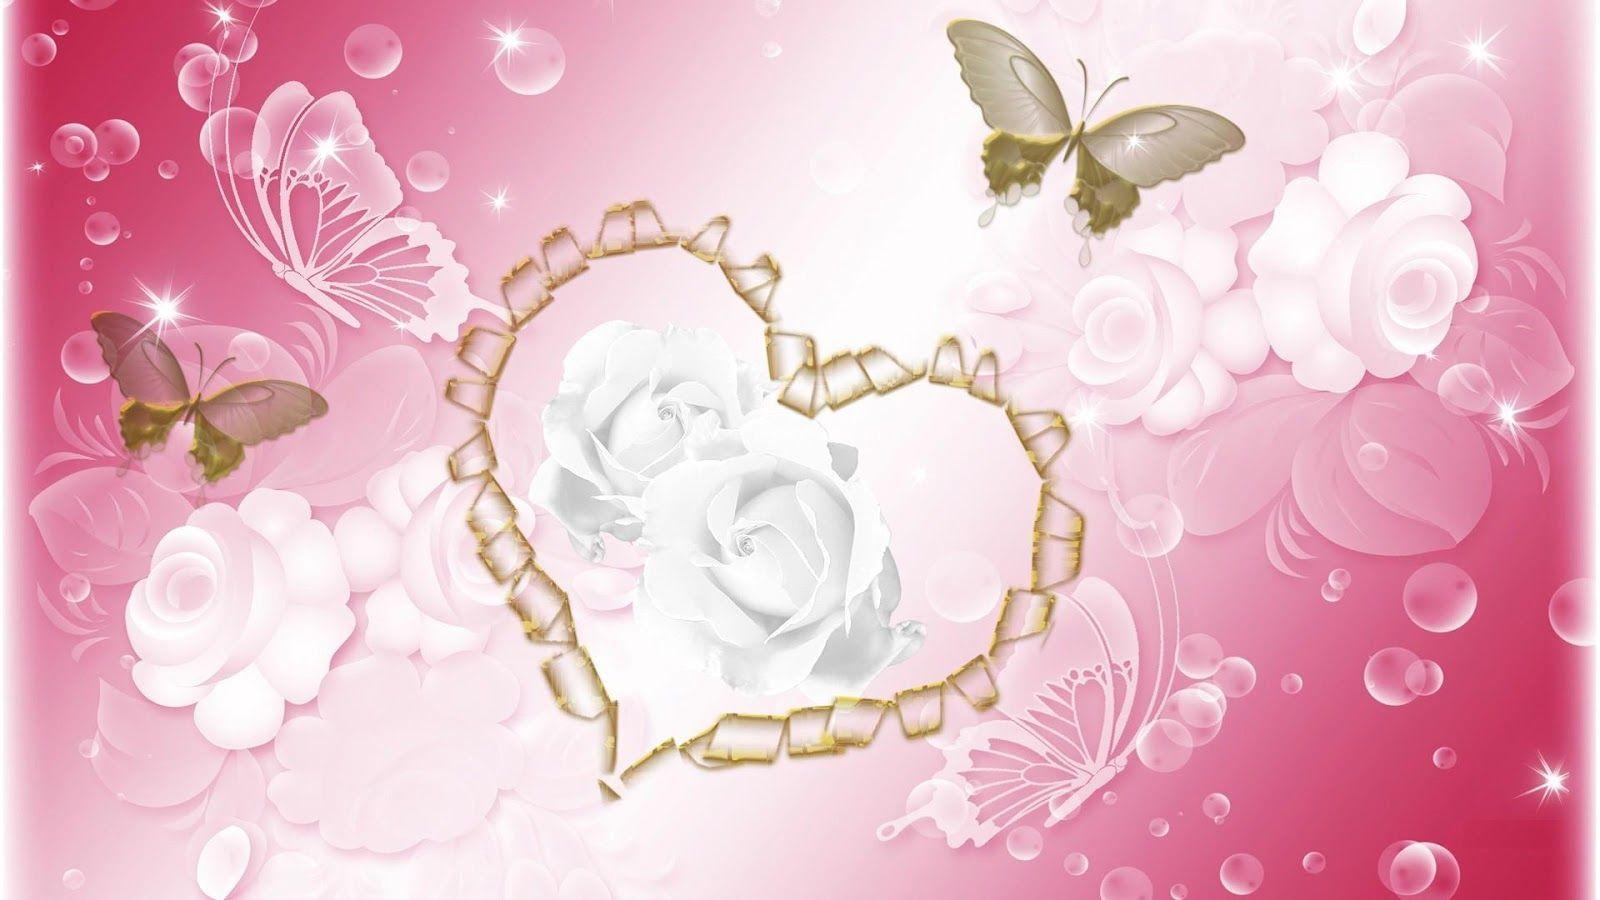 Wonderful Wallpaper Love Flower - be324ab38b60fe6622f6152685f10104  Photograph_457874.jpg